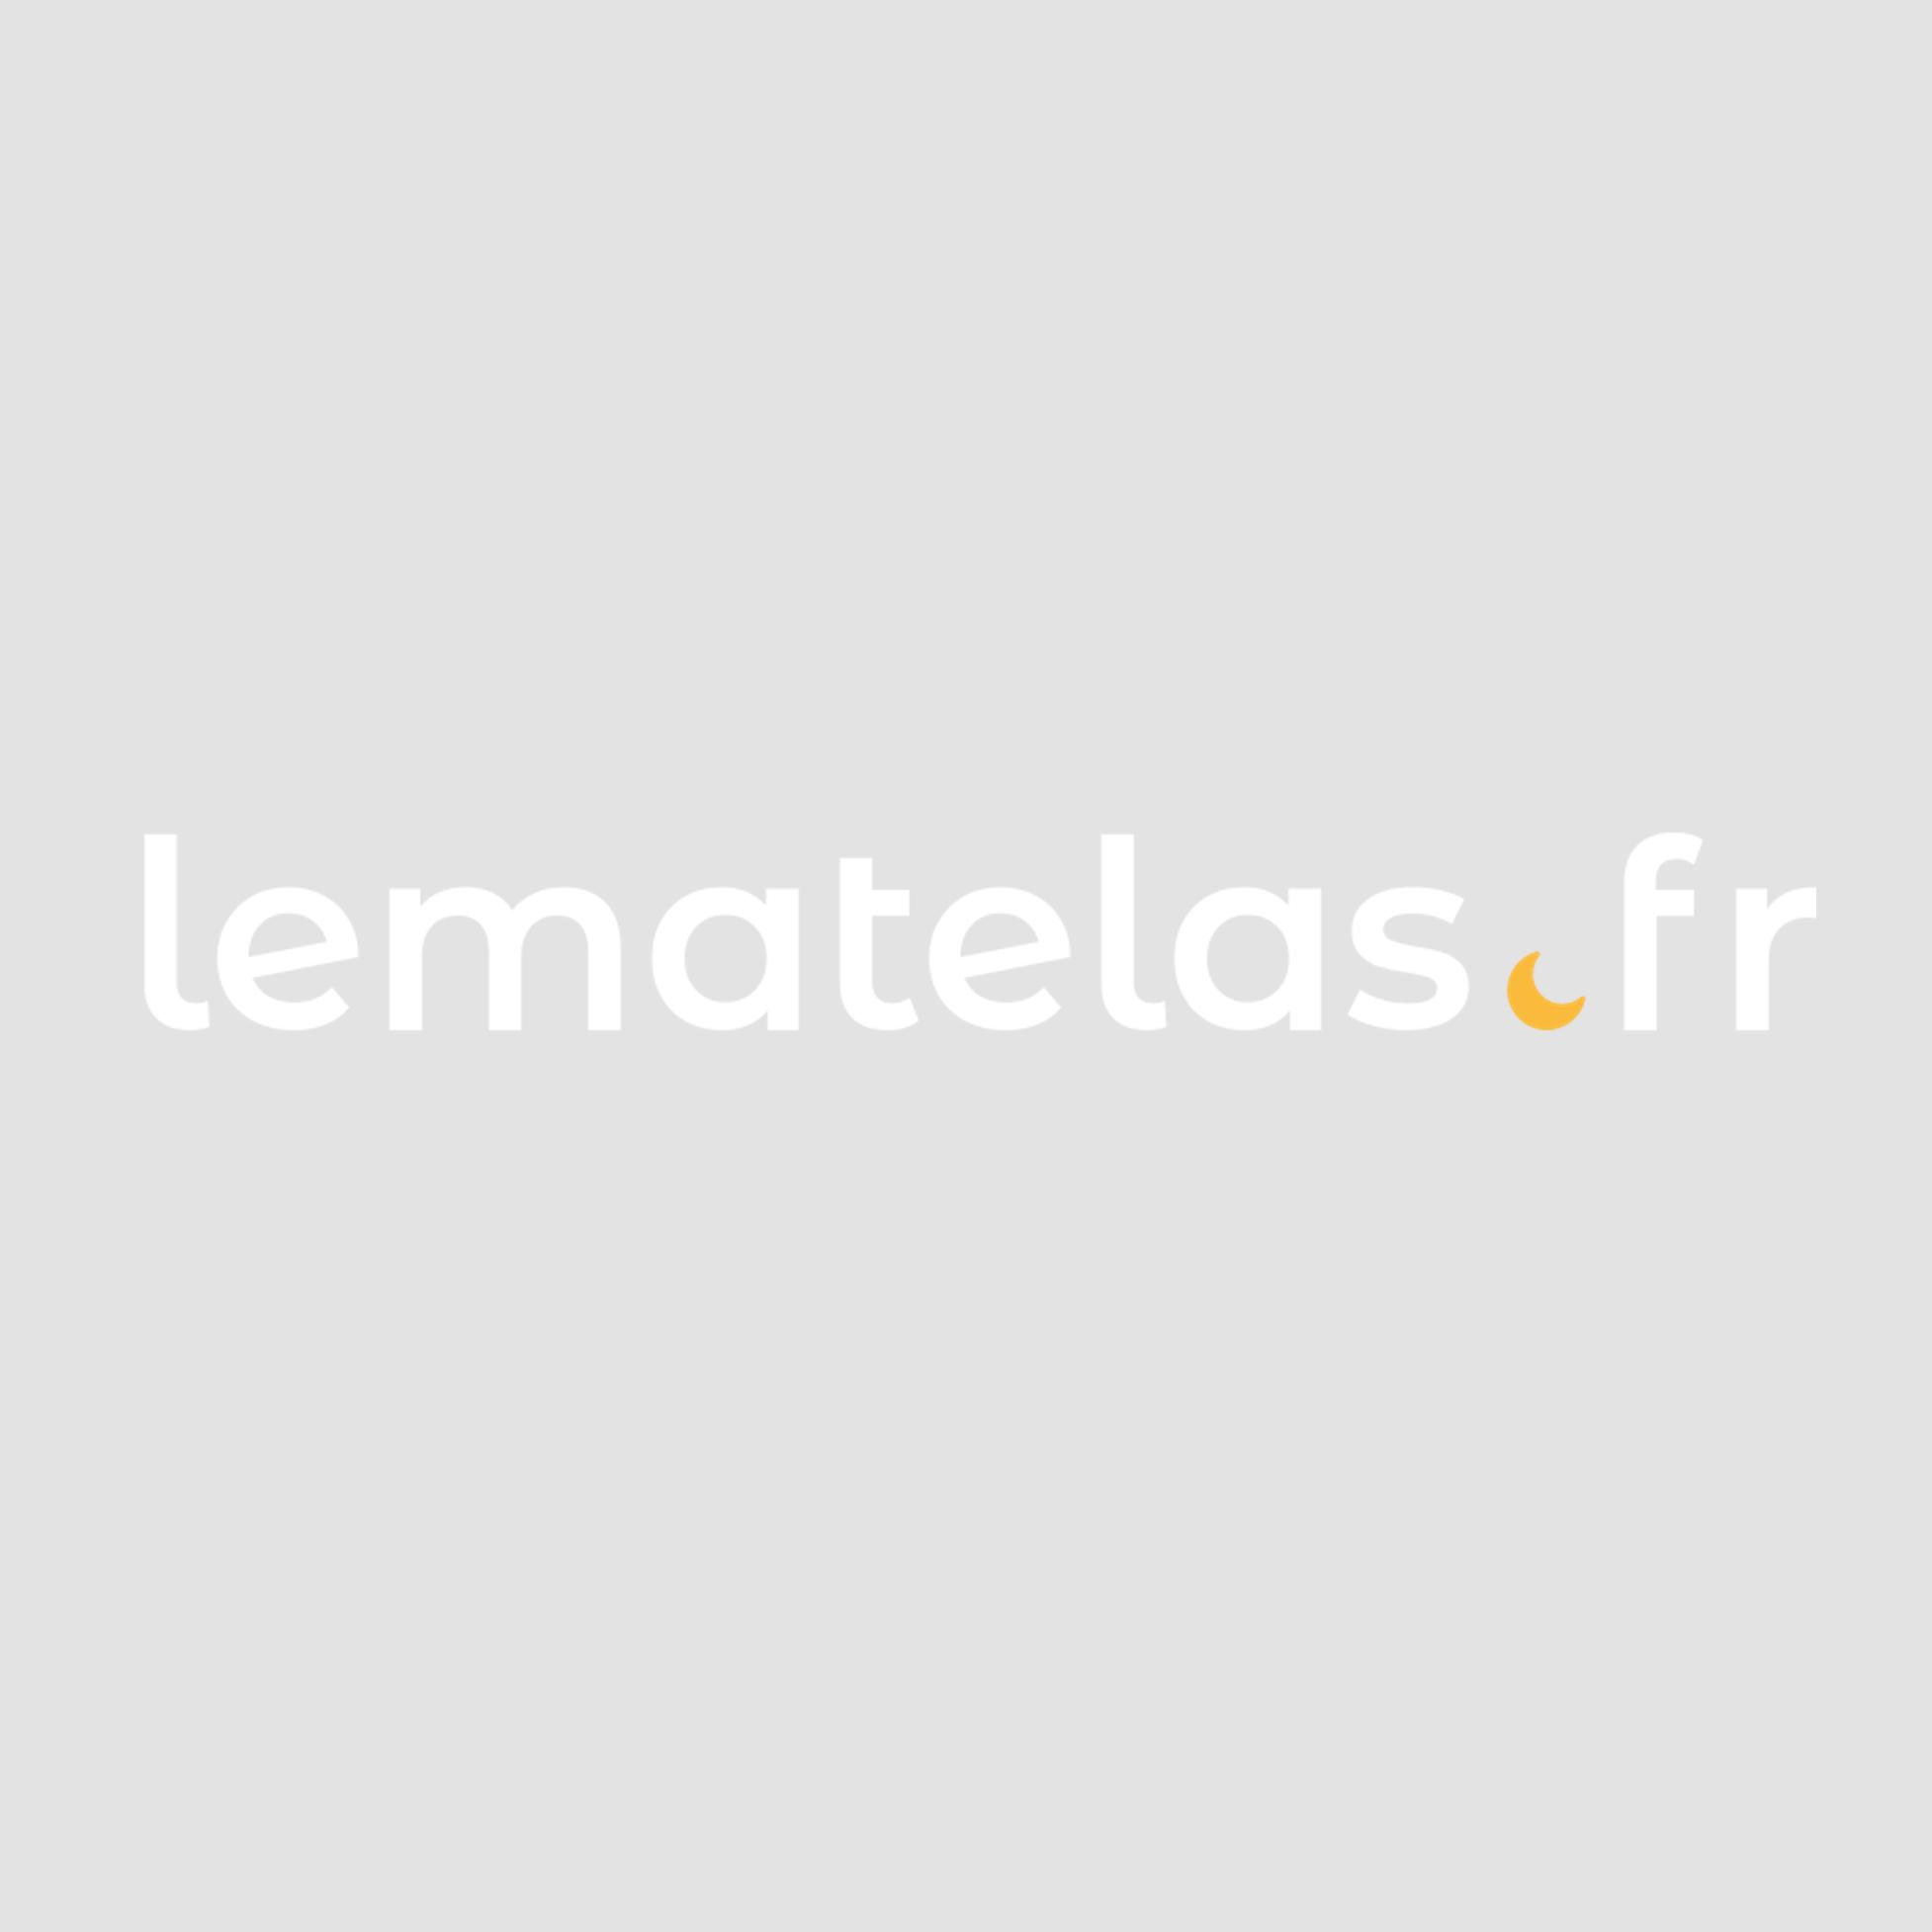 lit en bois pin memphis 140x190 lt1003. Black Bedroom Furniture Sets. Home Design Ideas